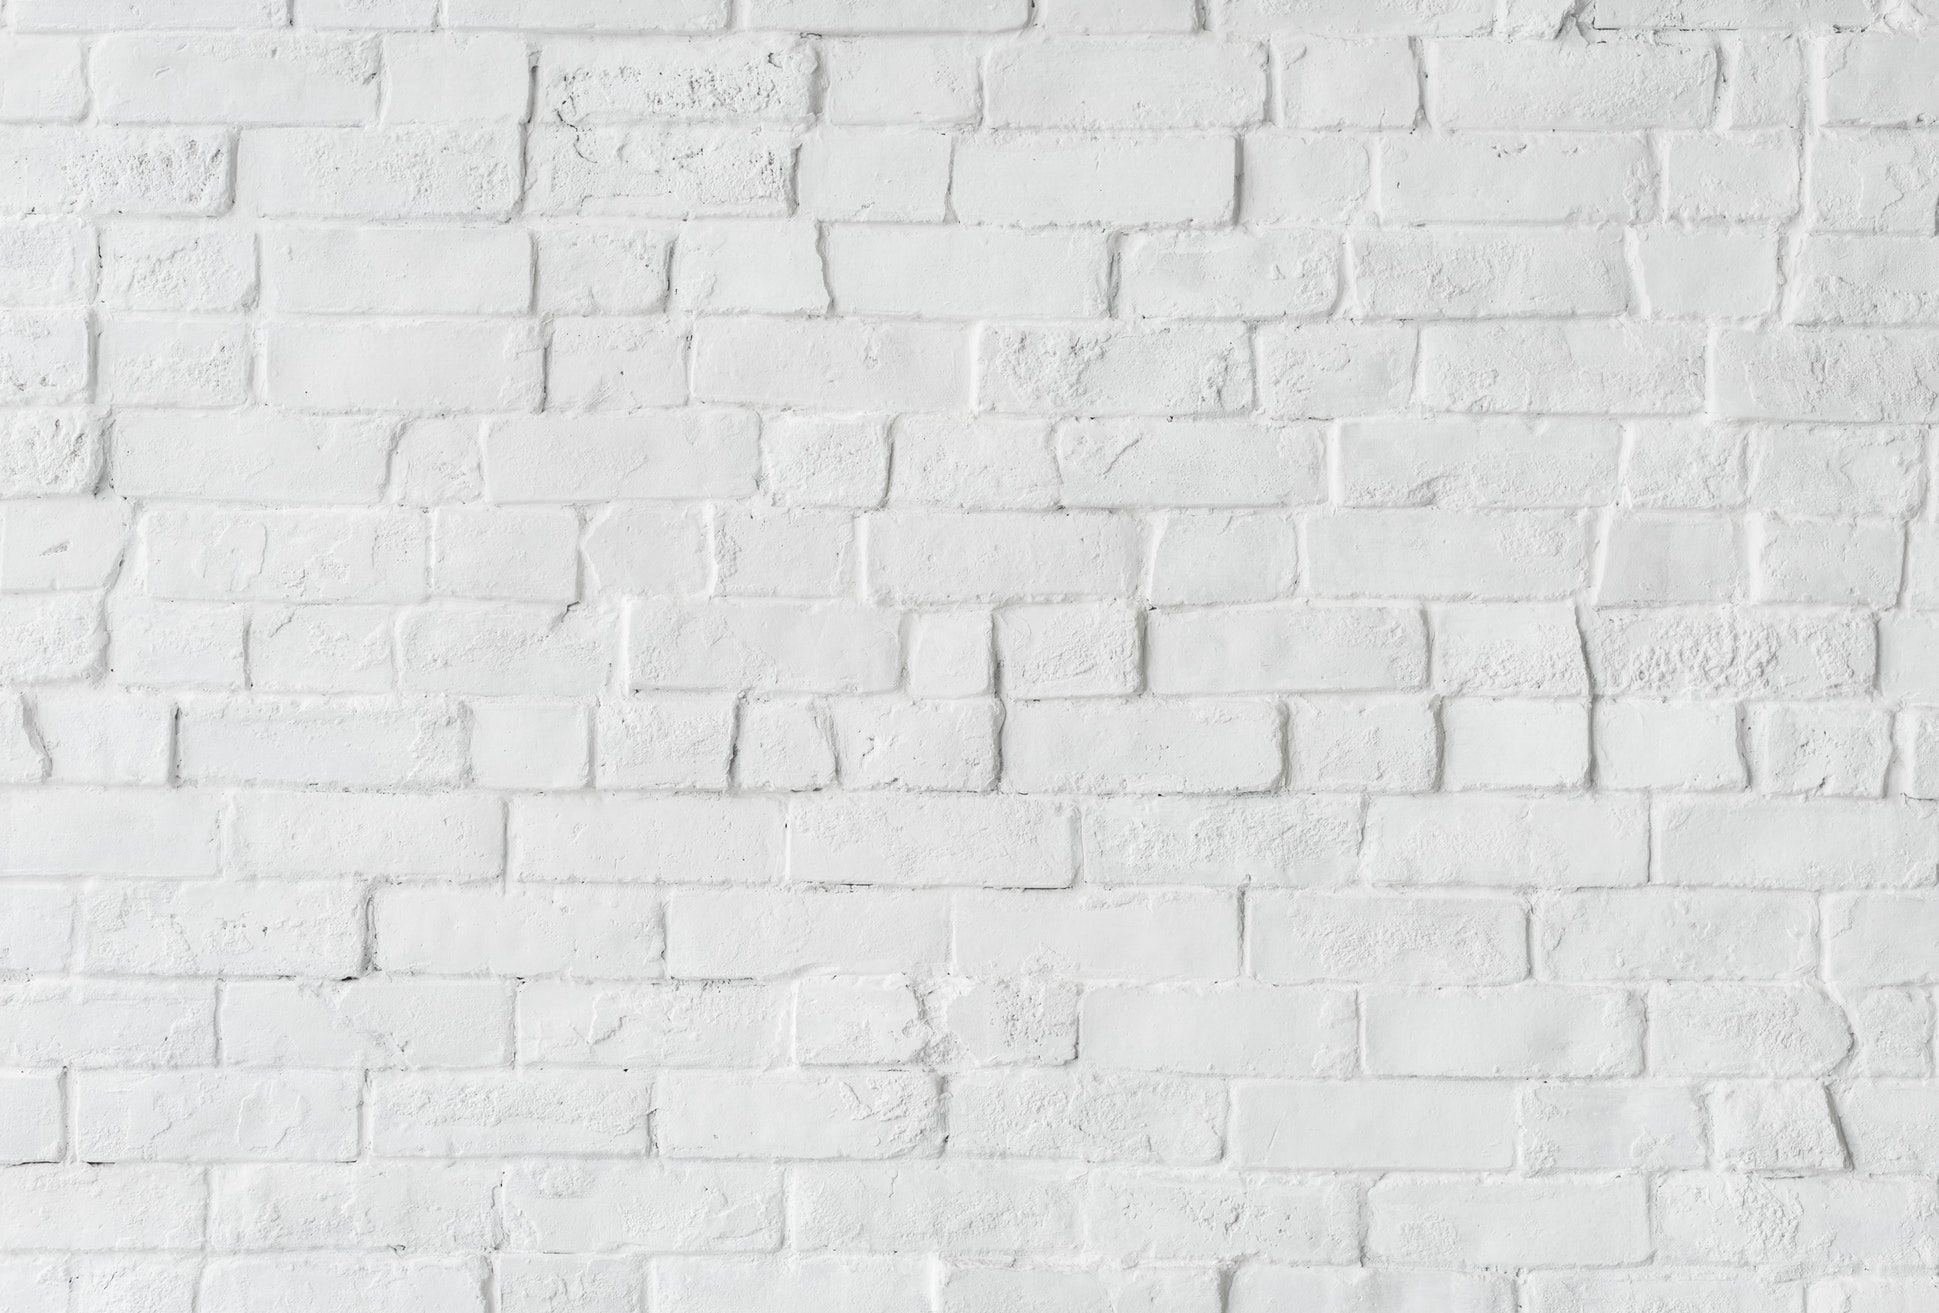 White Concrete Brick Wall White Brick Walls Black Brick Wallpaper Brick Wall Background